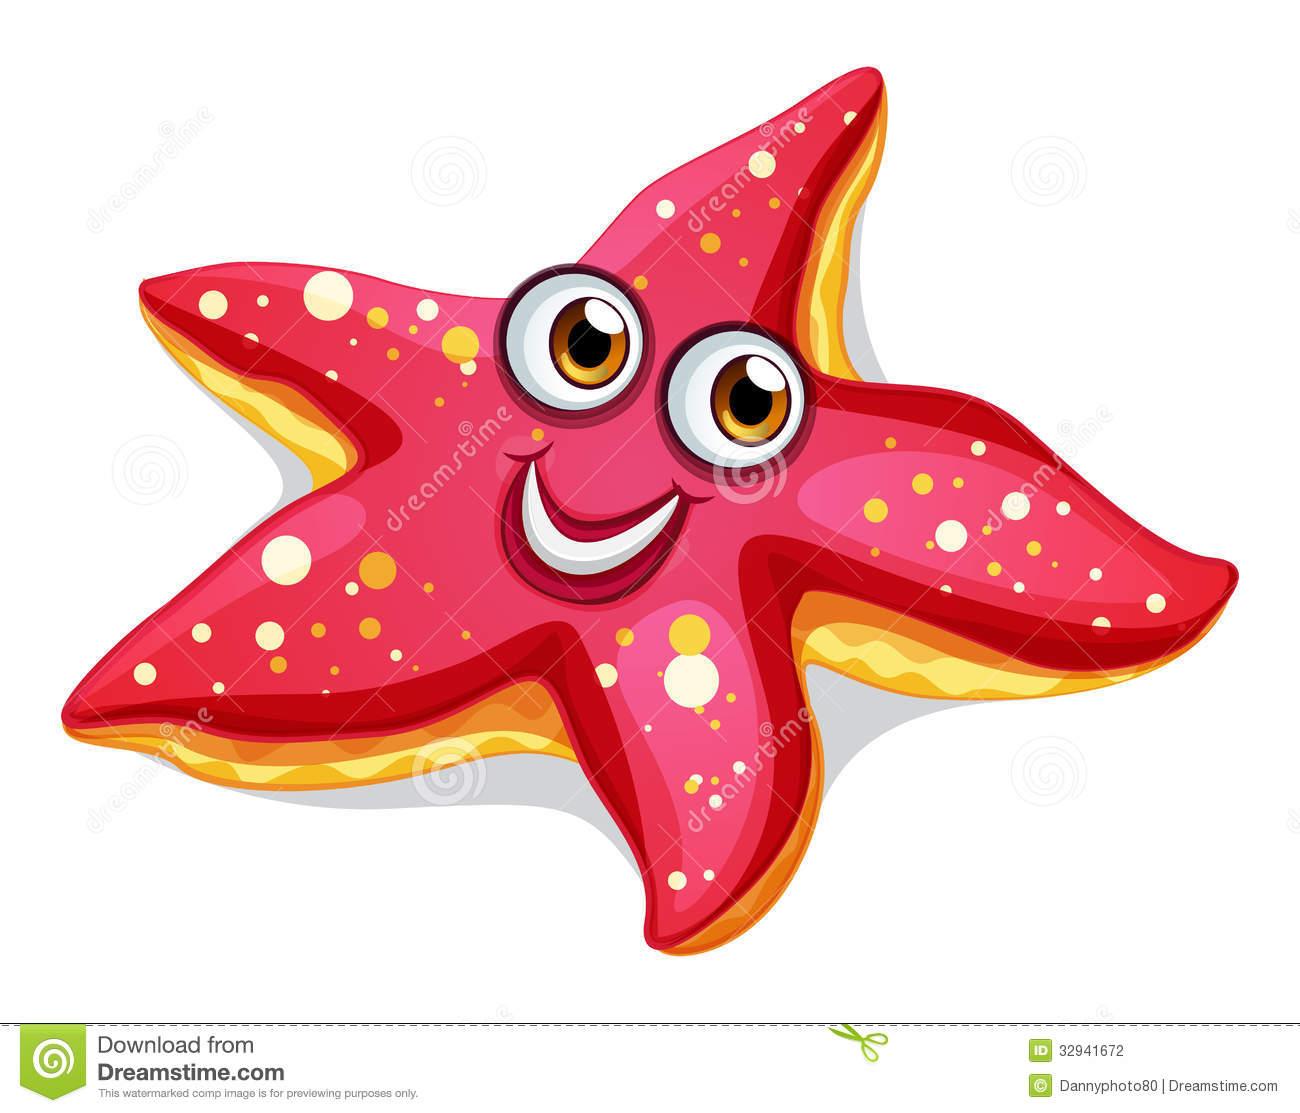 Clip art star fish.